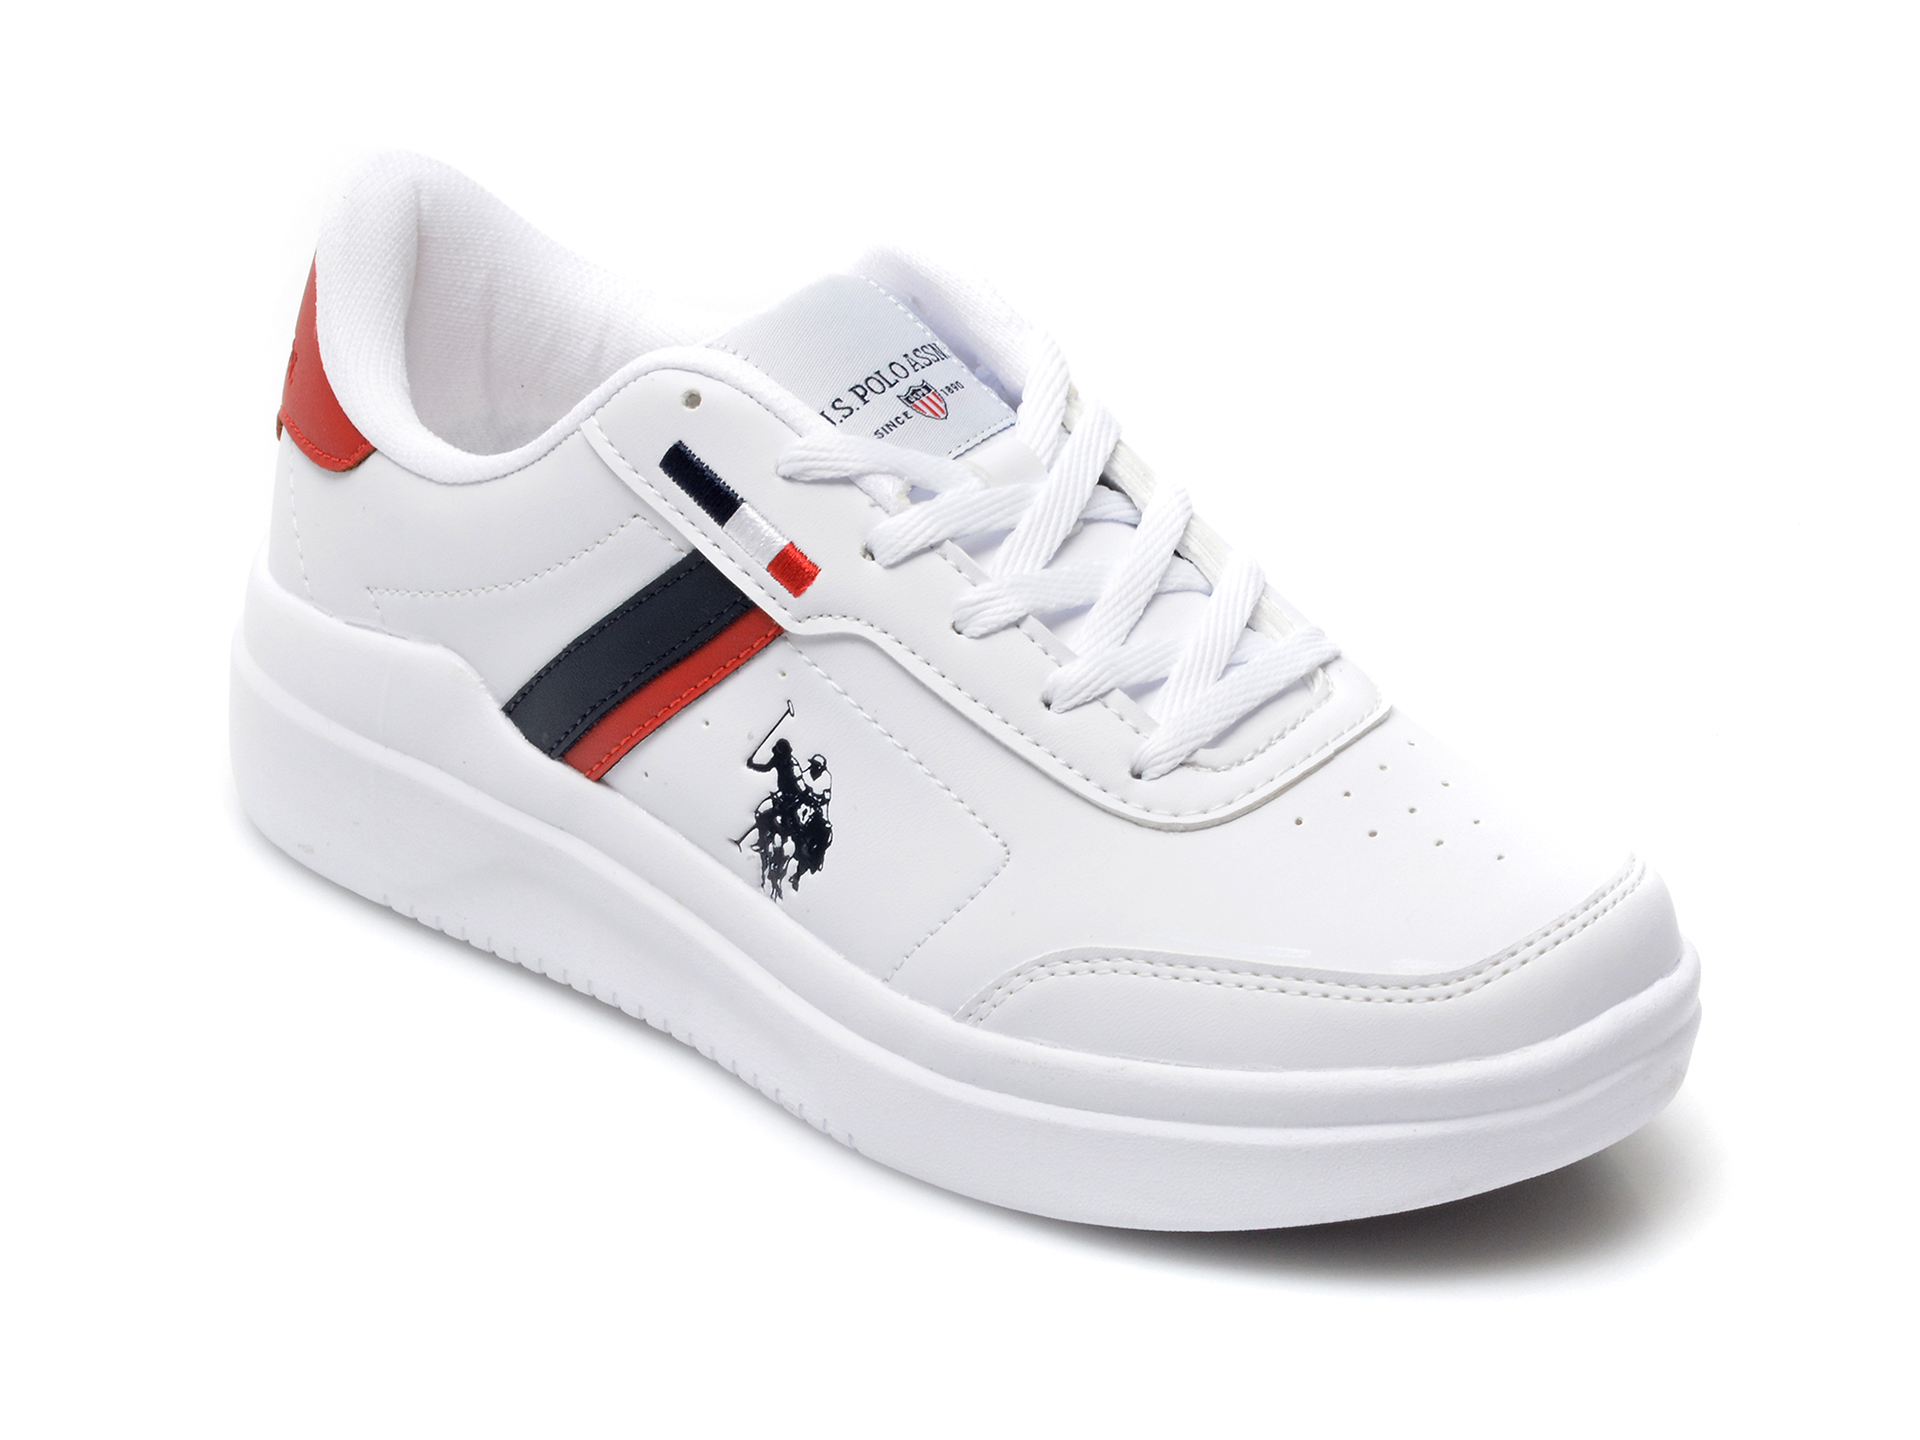 Pantofi sport US POLO ASSN albi, THUNDER, din piele ecologica